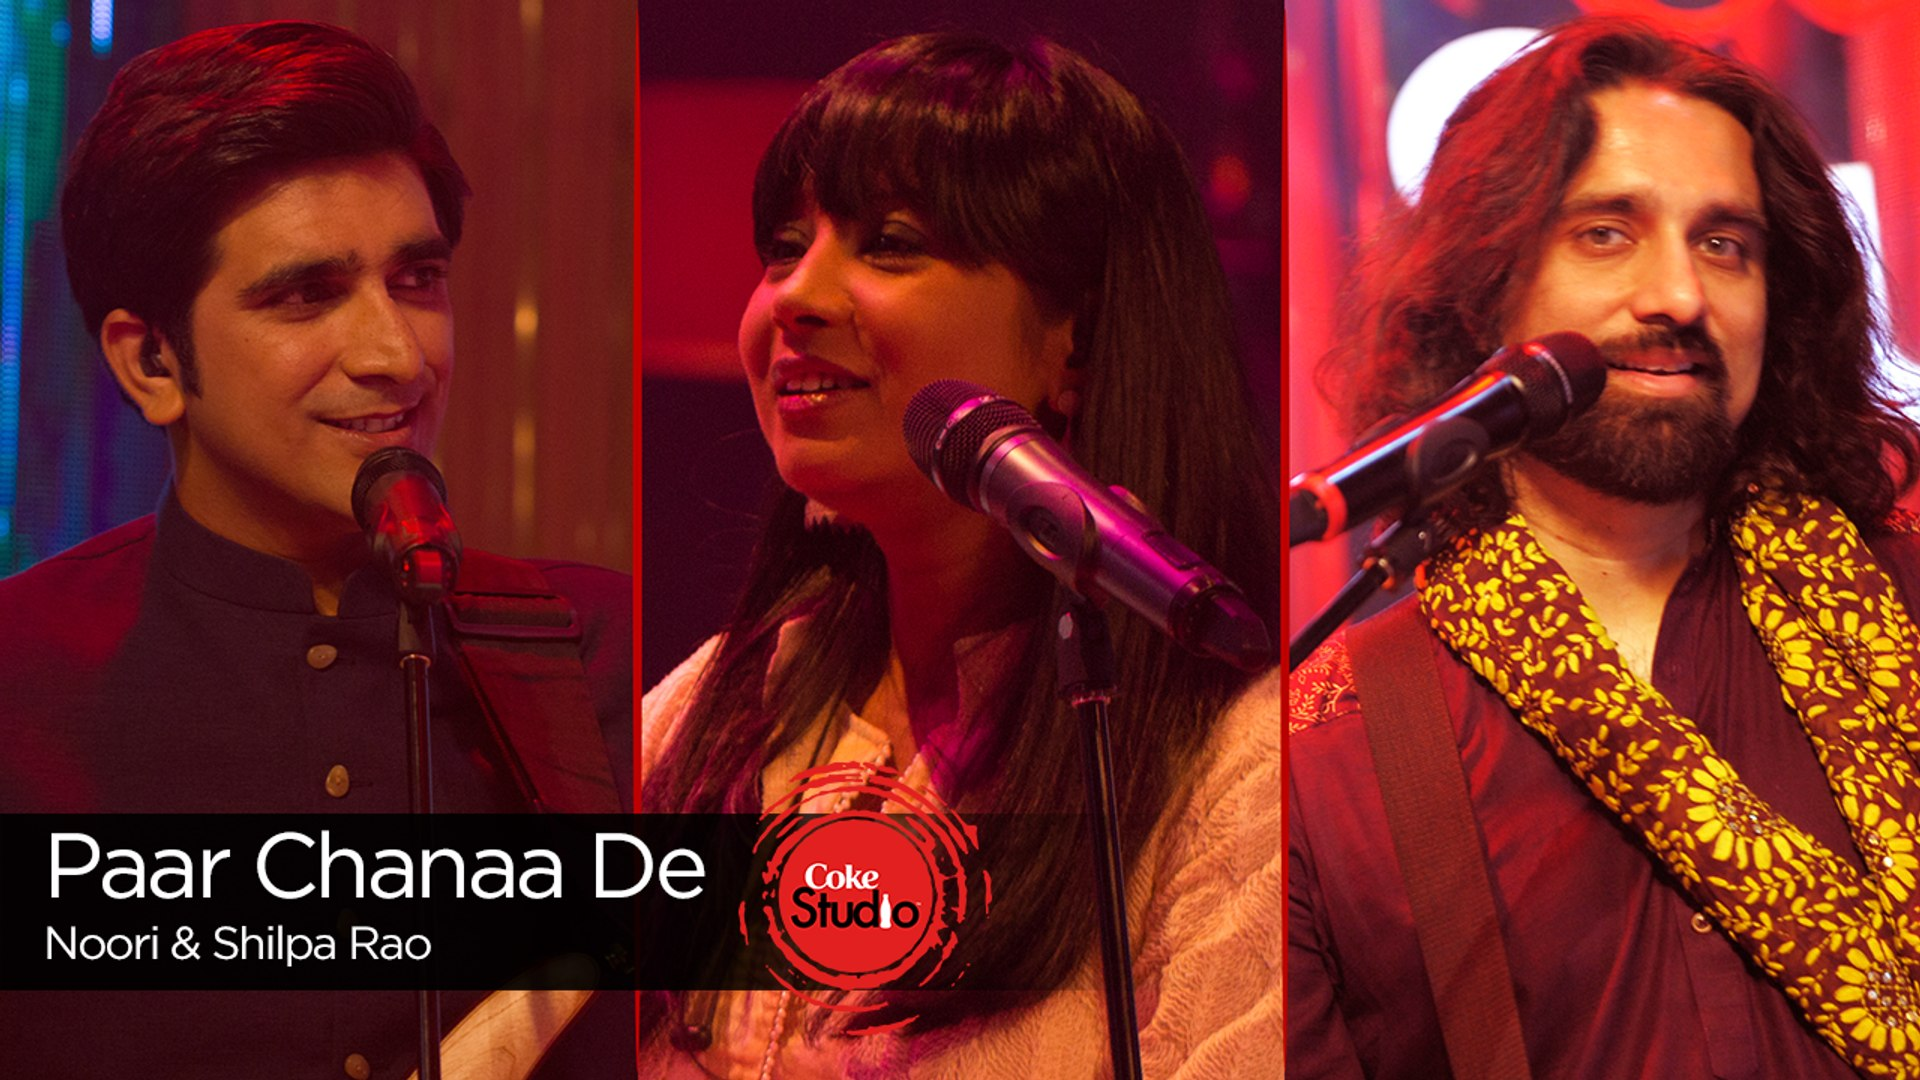 Paar Chanaa De Shilpa Rao Noori Episode 4 Coke Studio Season 9